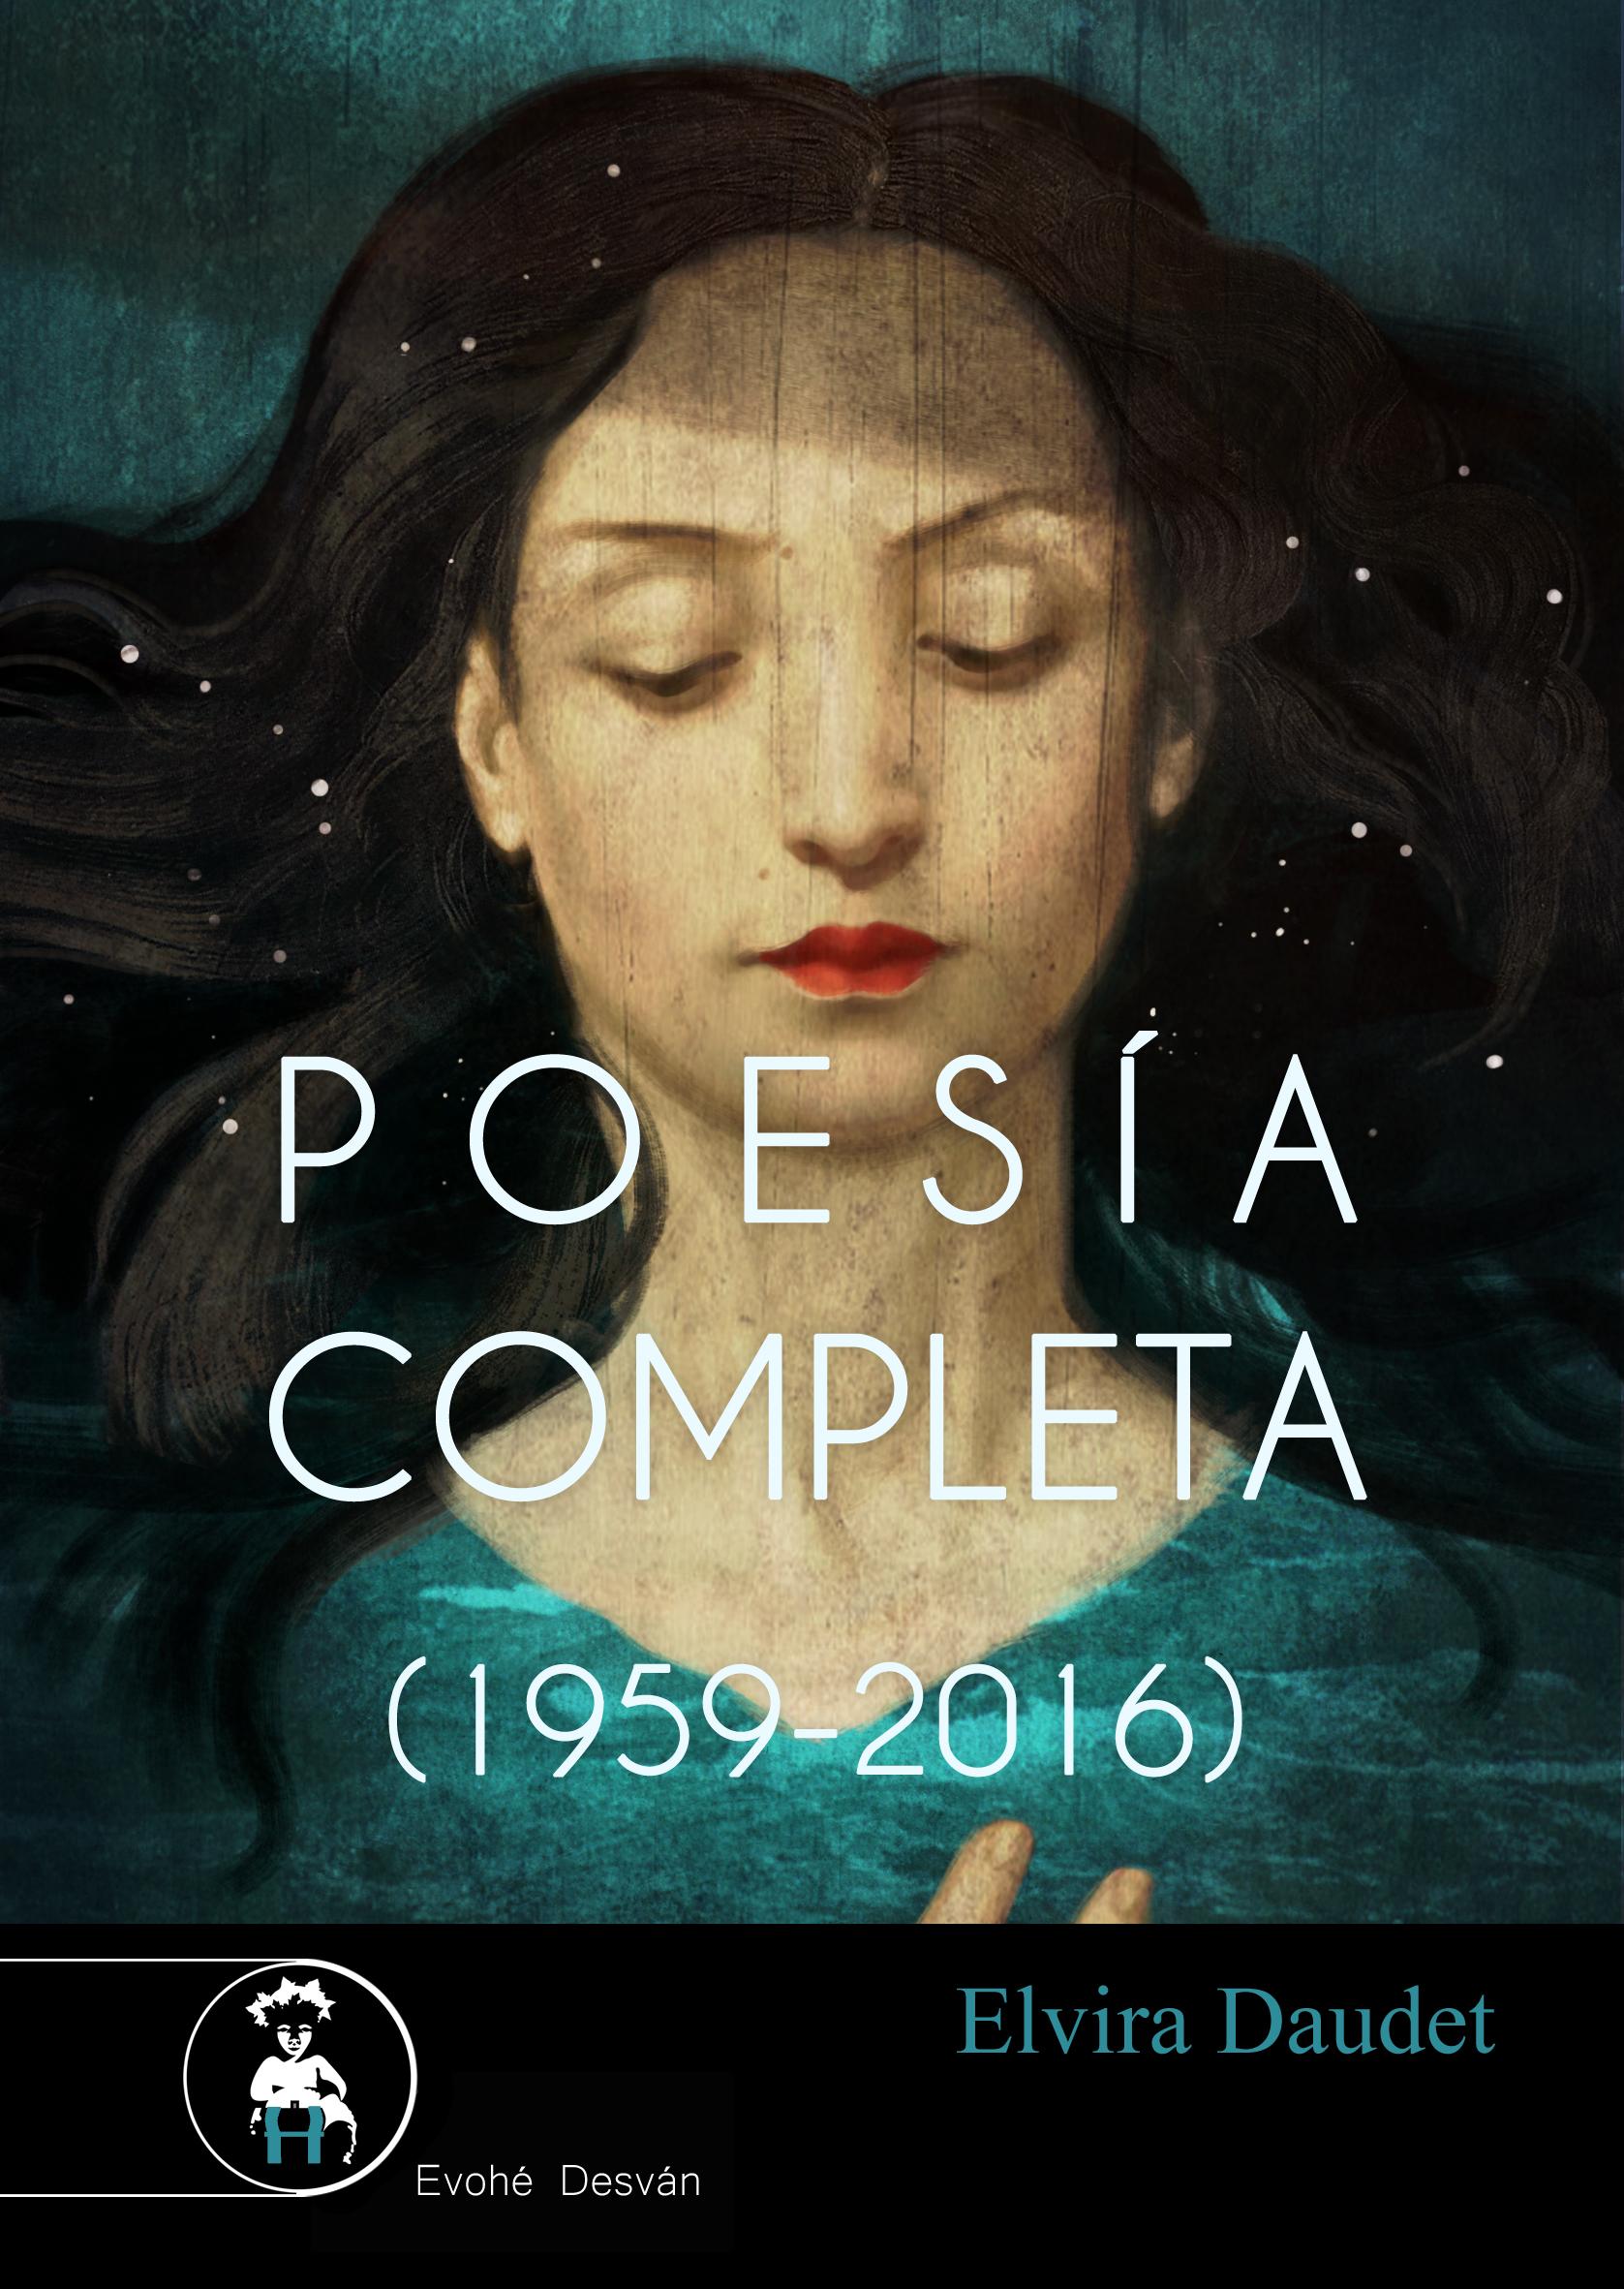 Poesía Completa (1959-2016) – Elvira Daudet